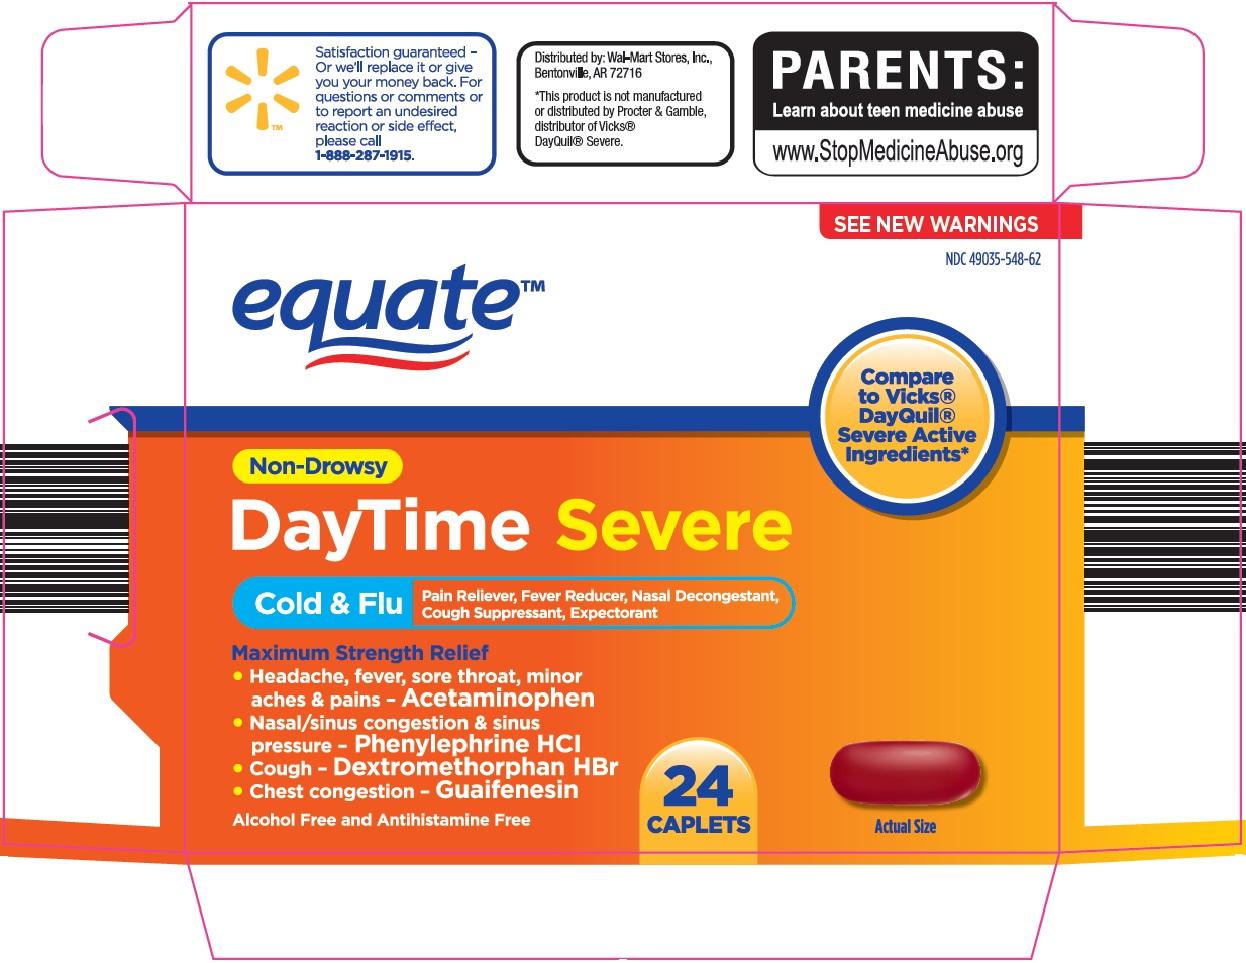 Equate DayTime Severe image 1